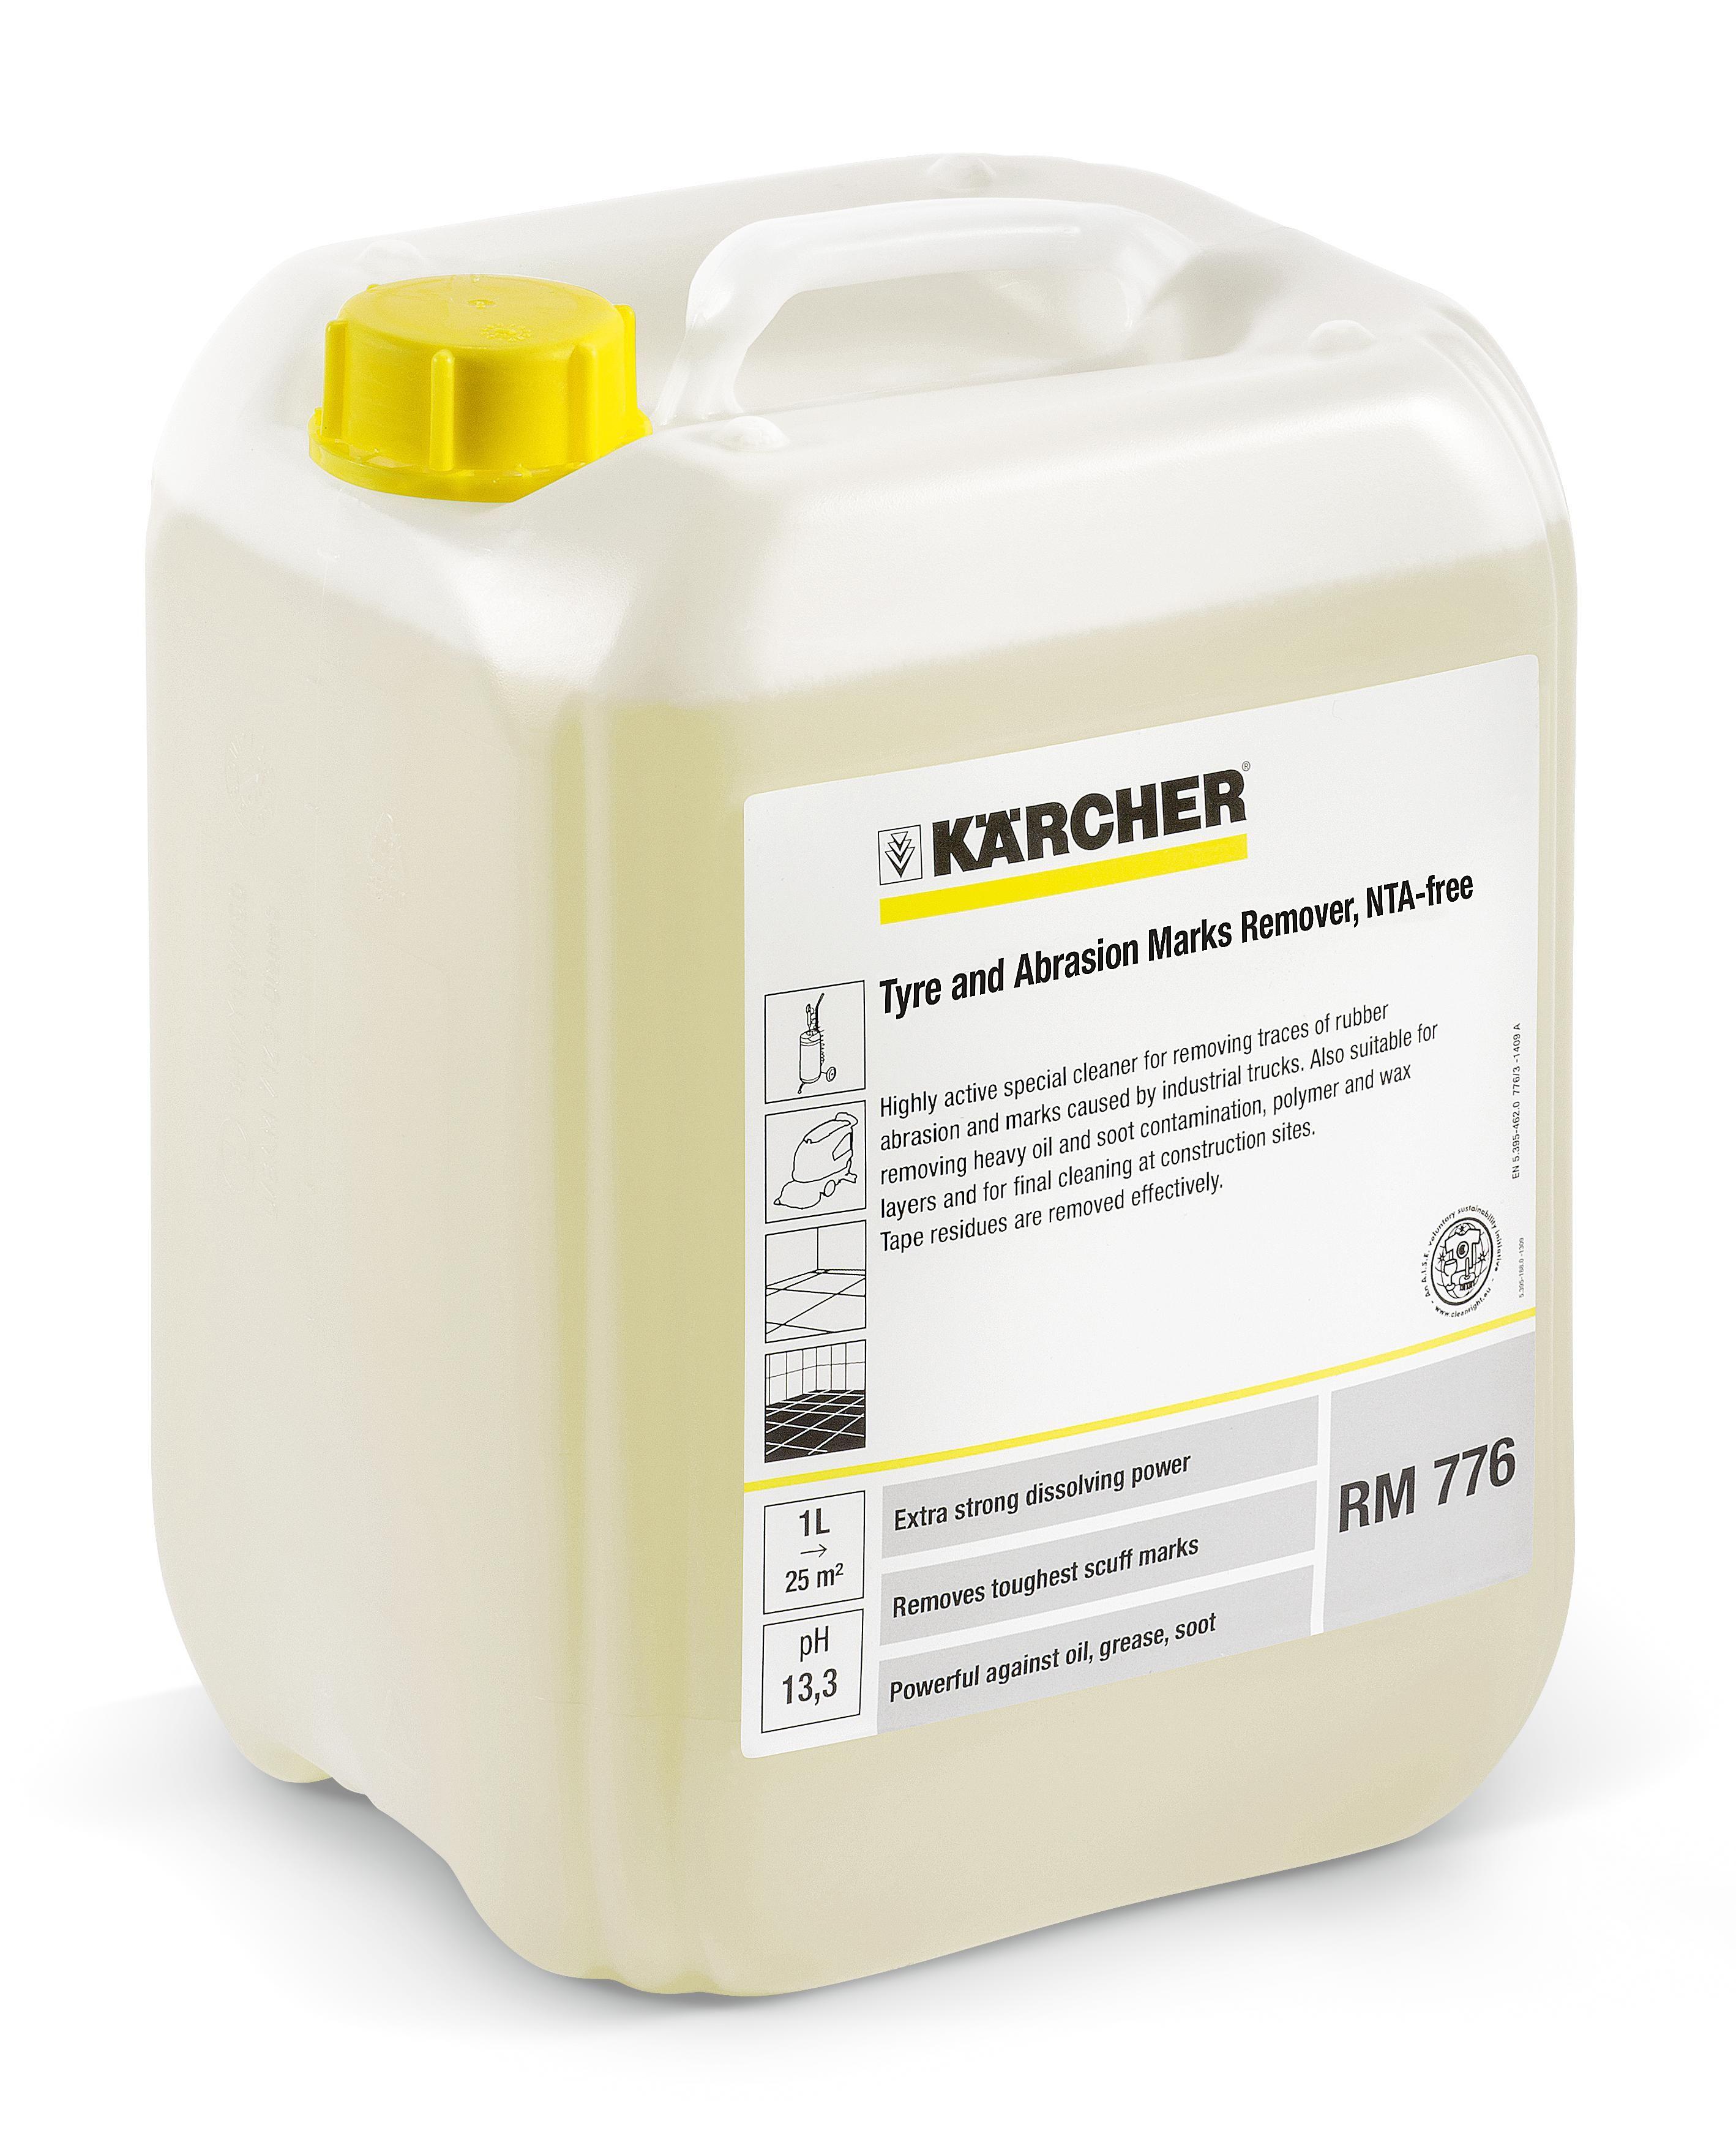 Kärcher Rengjøring RM 776 10L (flaske med 10 l) 6.295-131.0